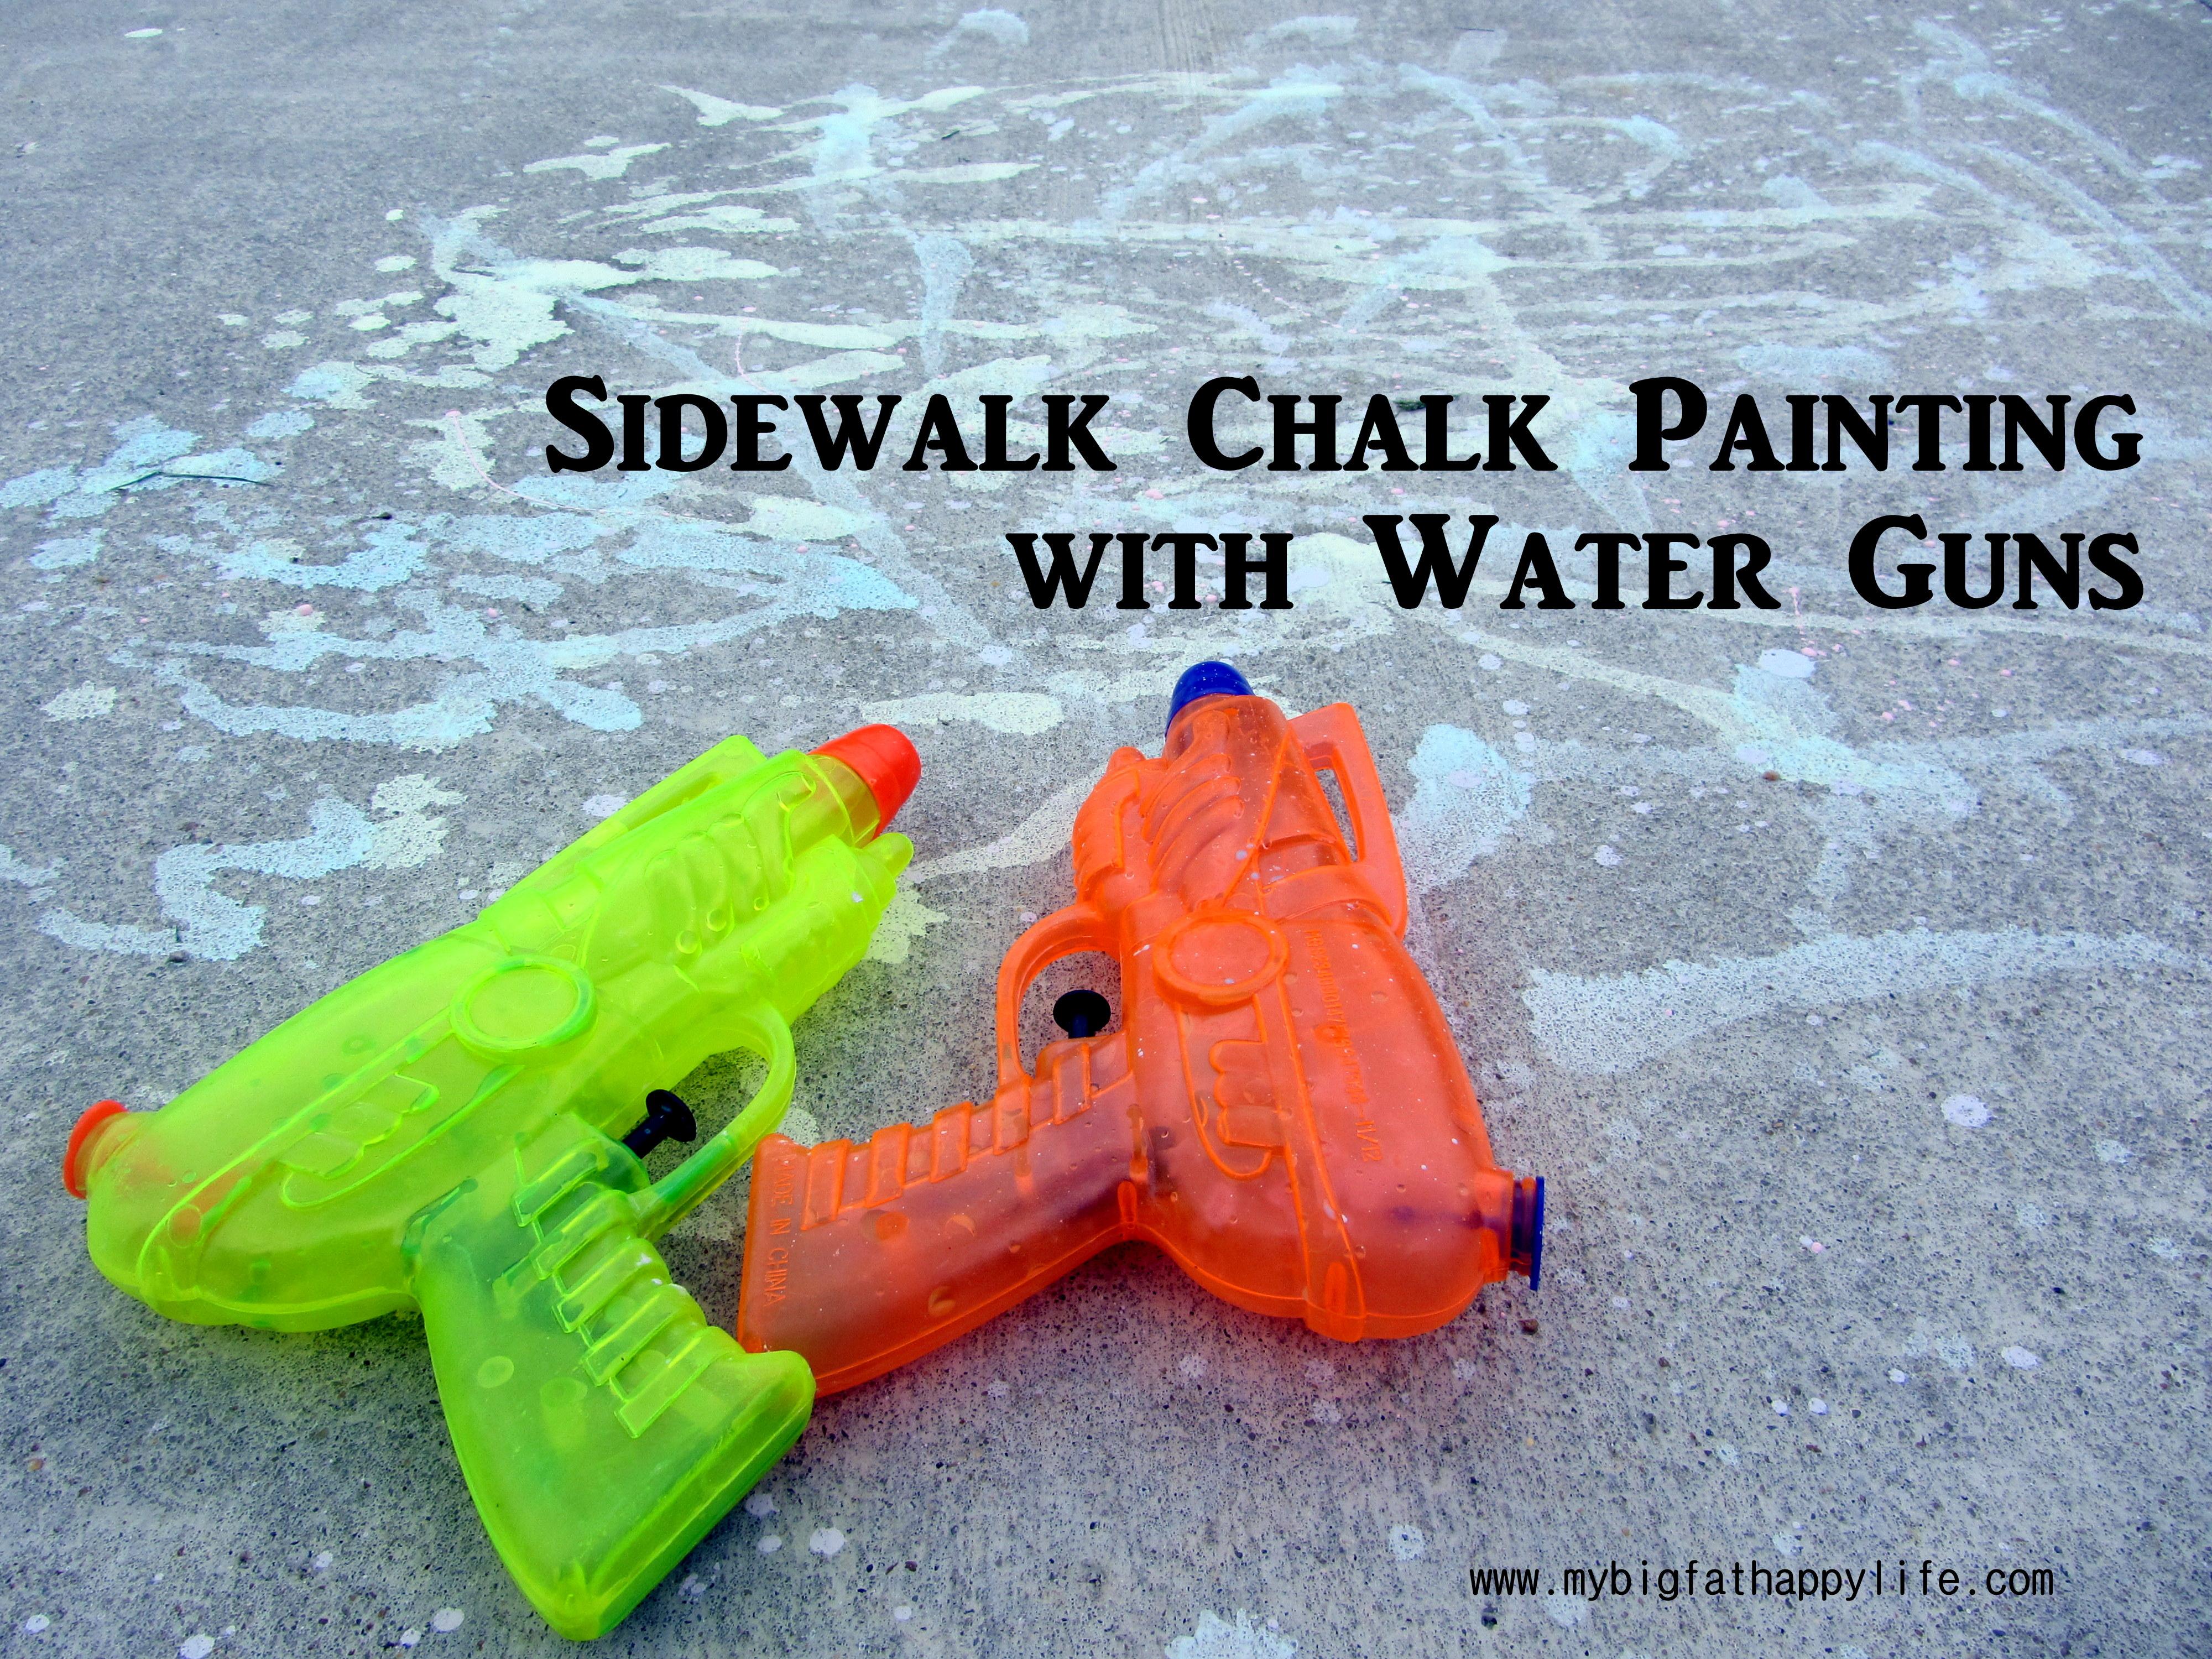 Sidewalk Chalk Paint with Water Guns | mybigfathappylife.com